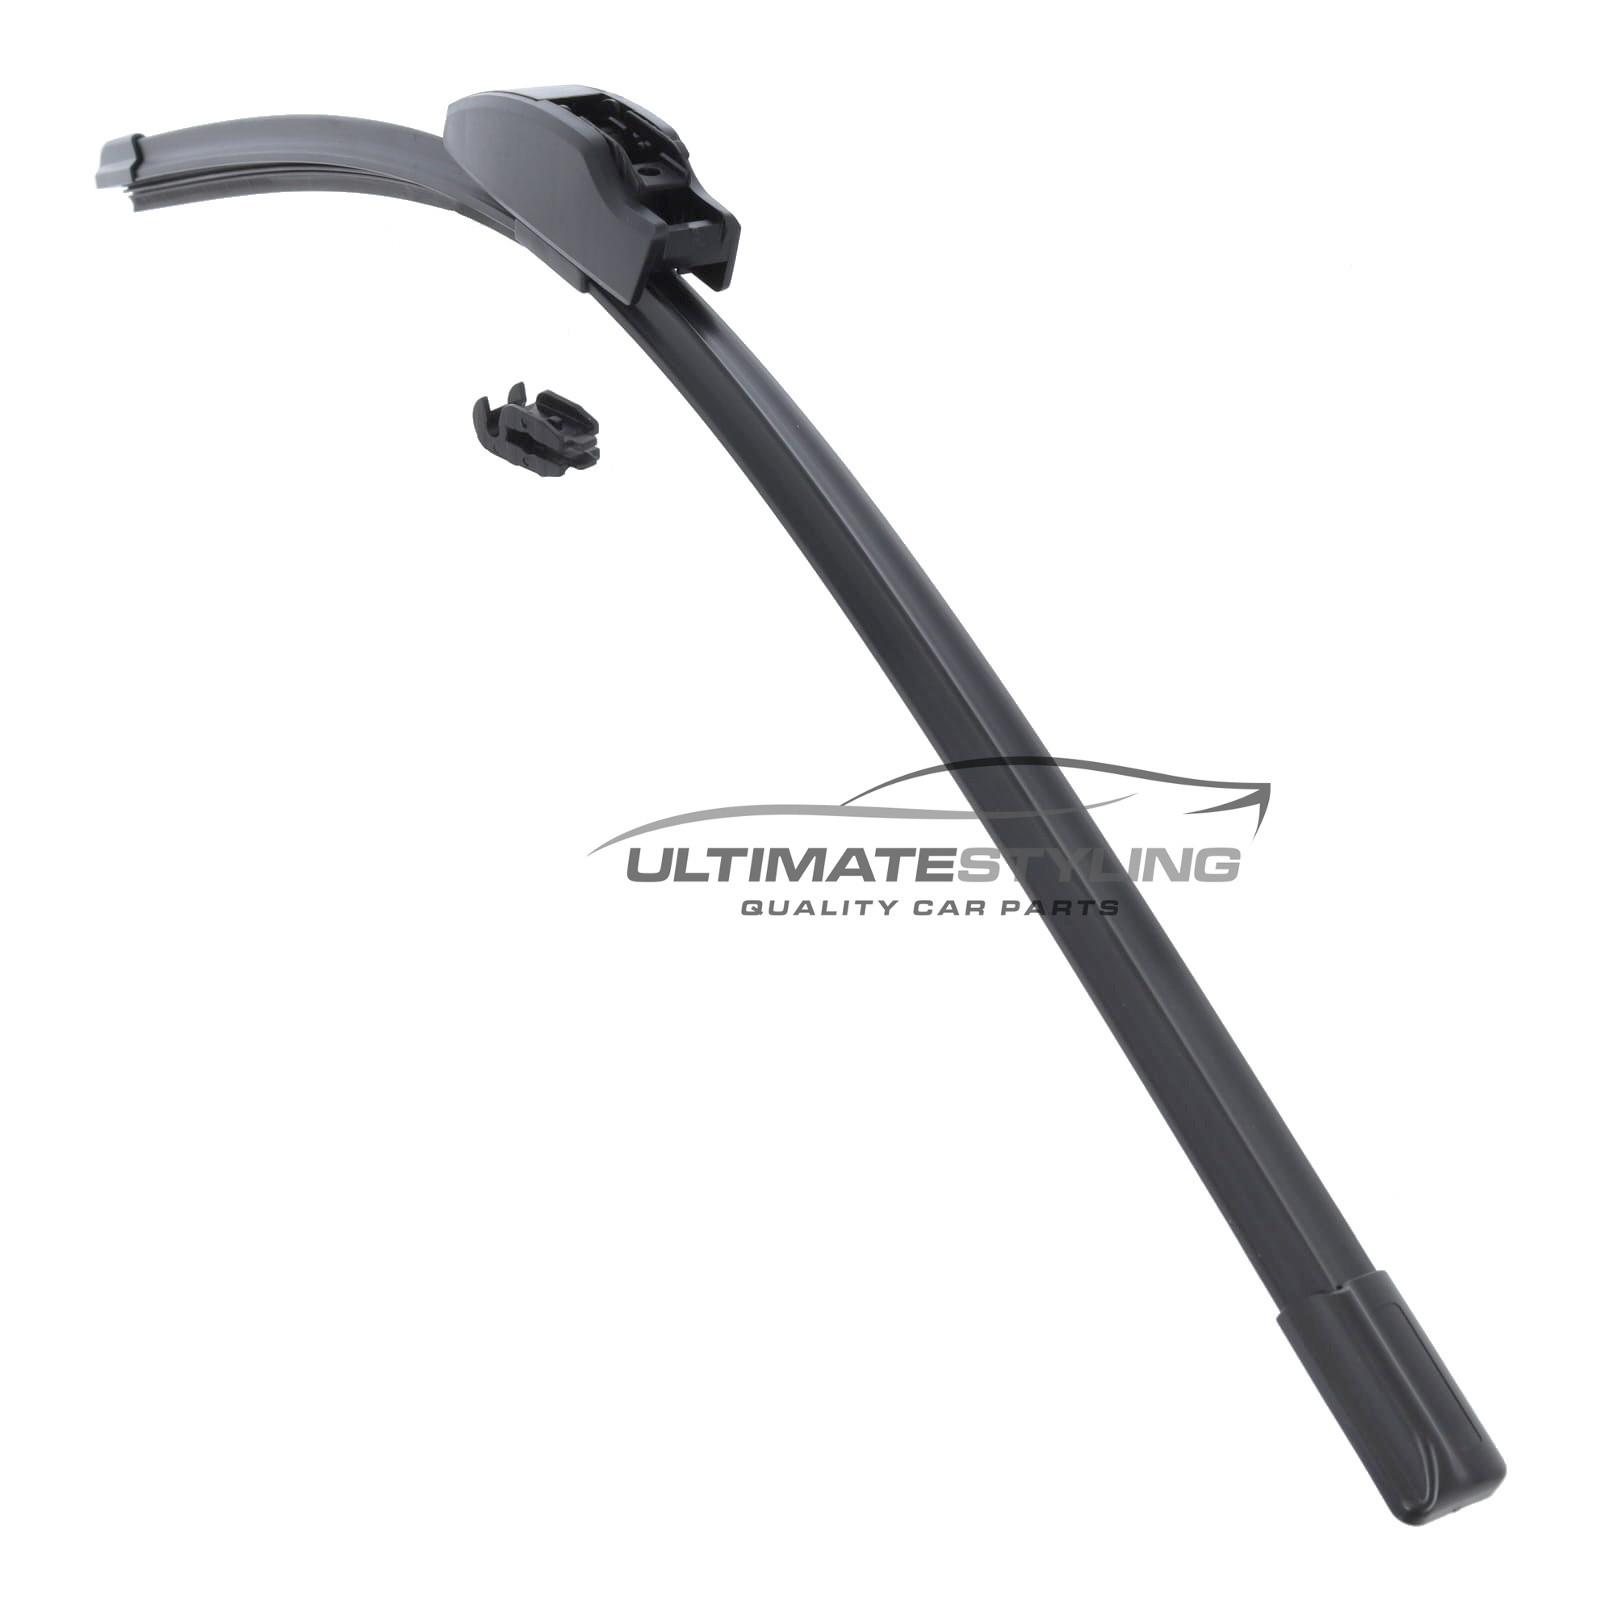 Wiper Blade - Exact Fit Aero Blade - 55 cm - 22 inch - Multi Fitment